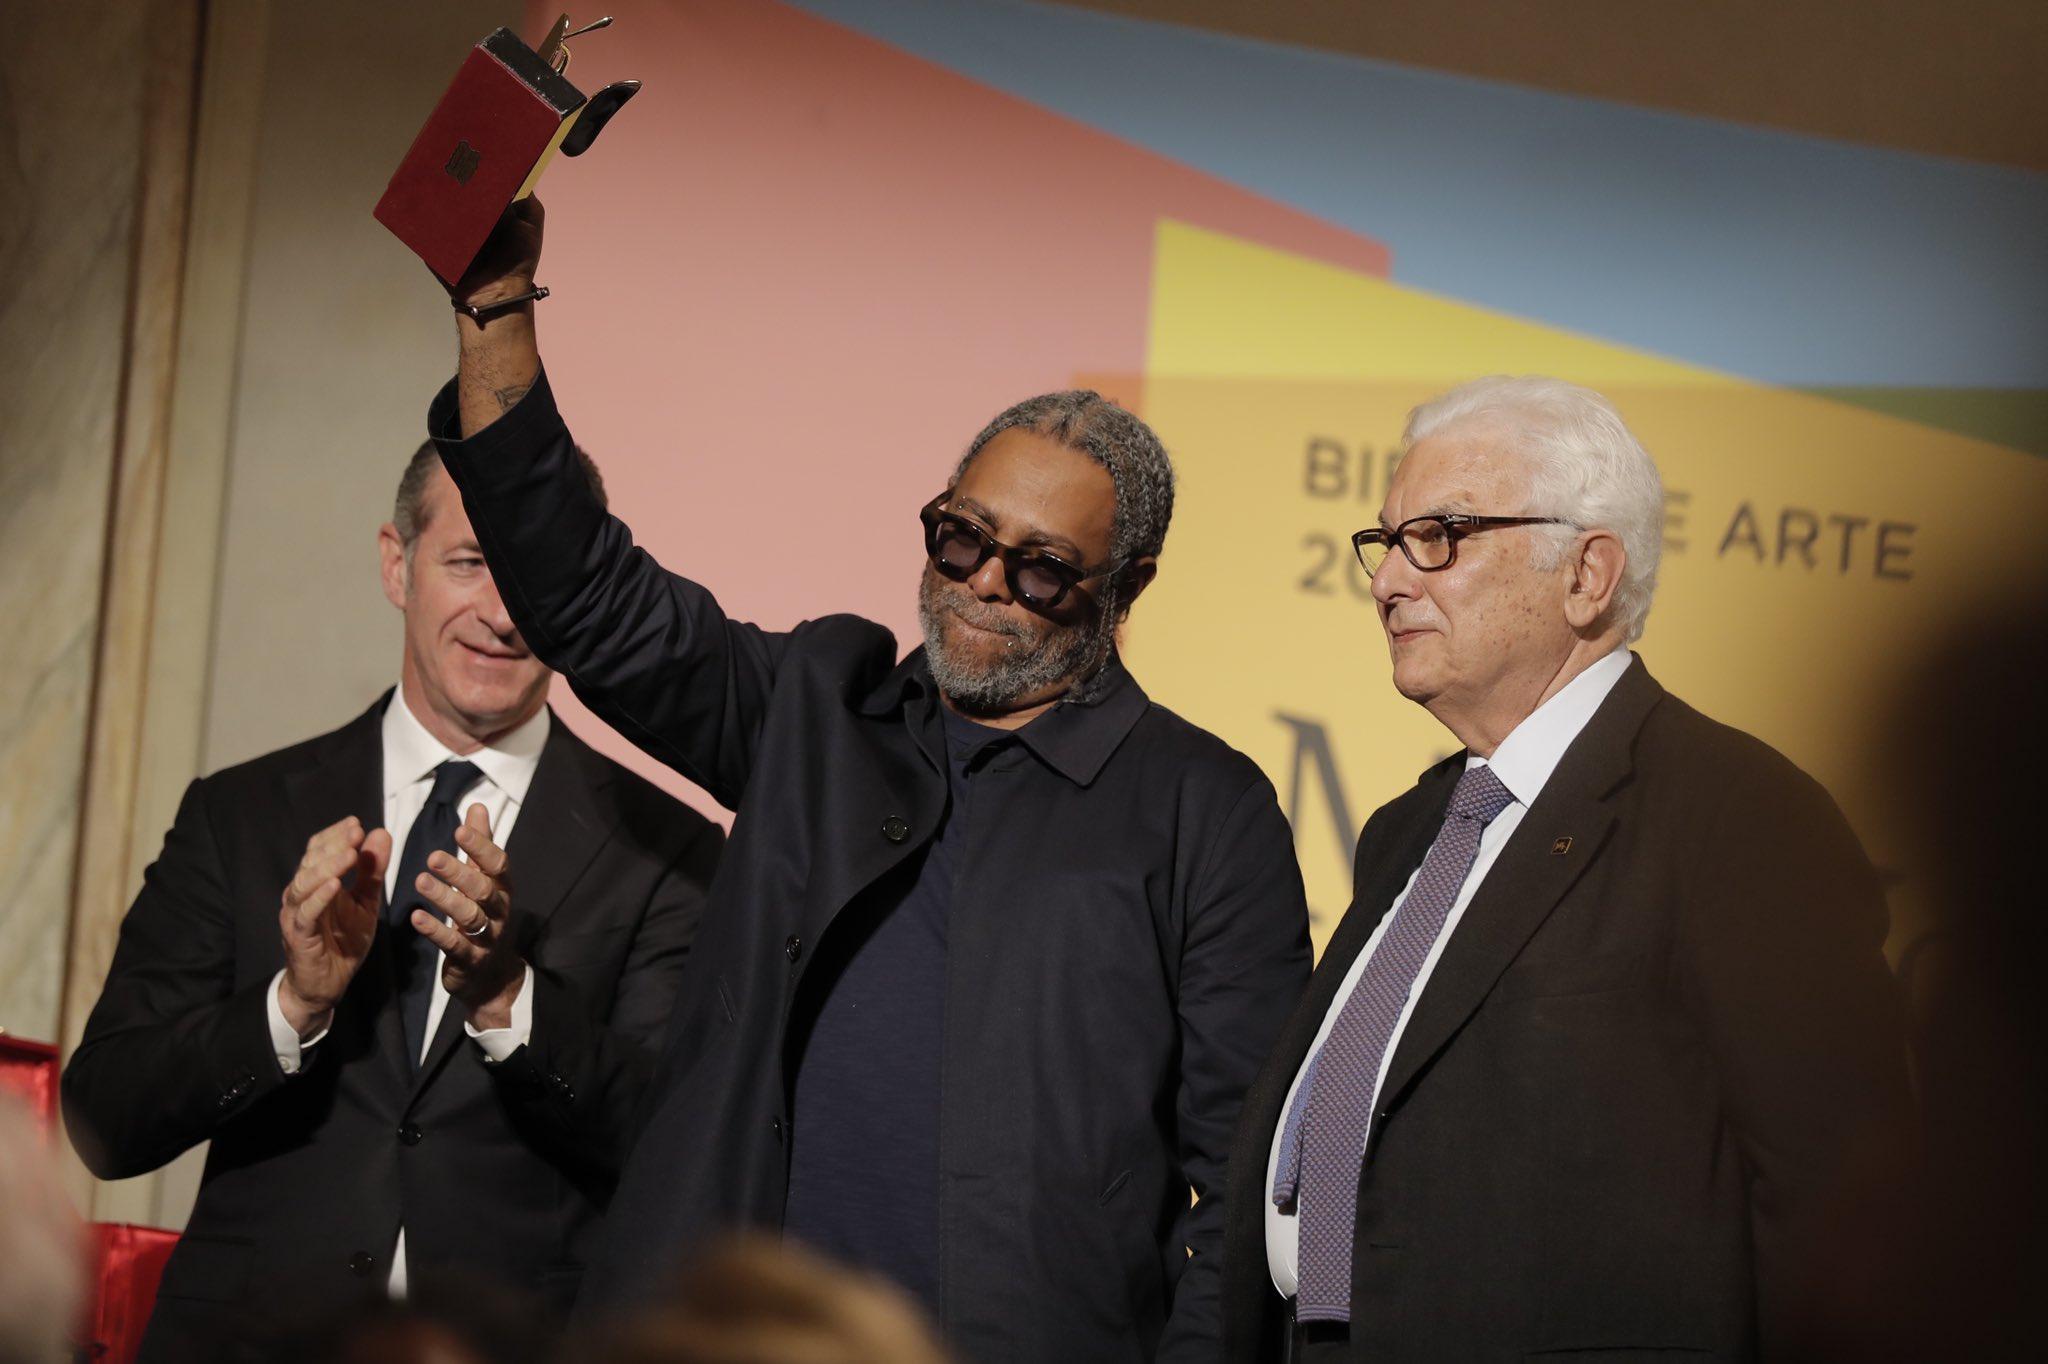 Arthur Jafa, Lithuania Win Top Prizes at Venice Biennale